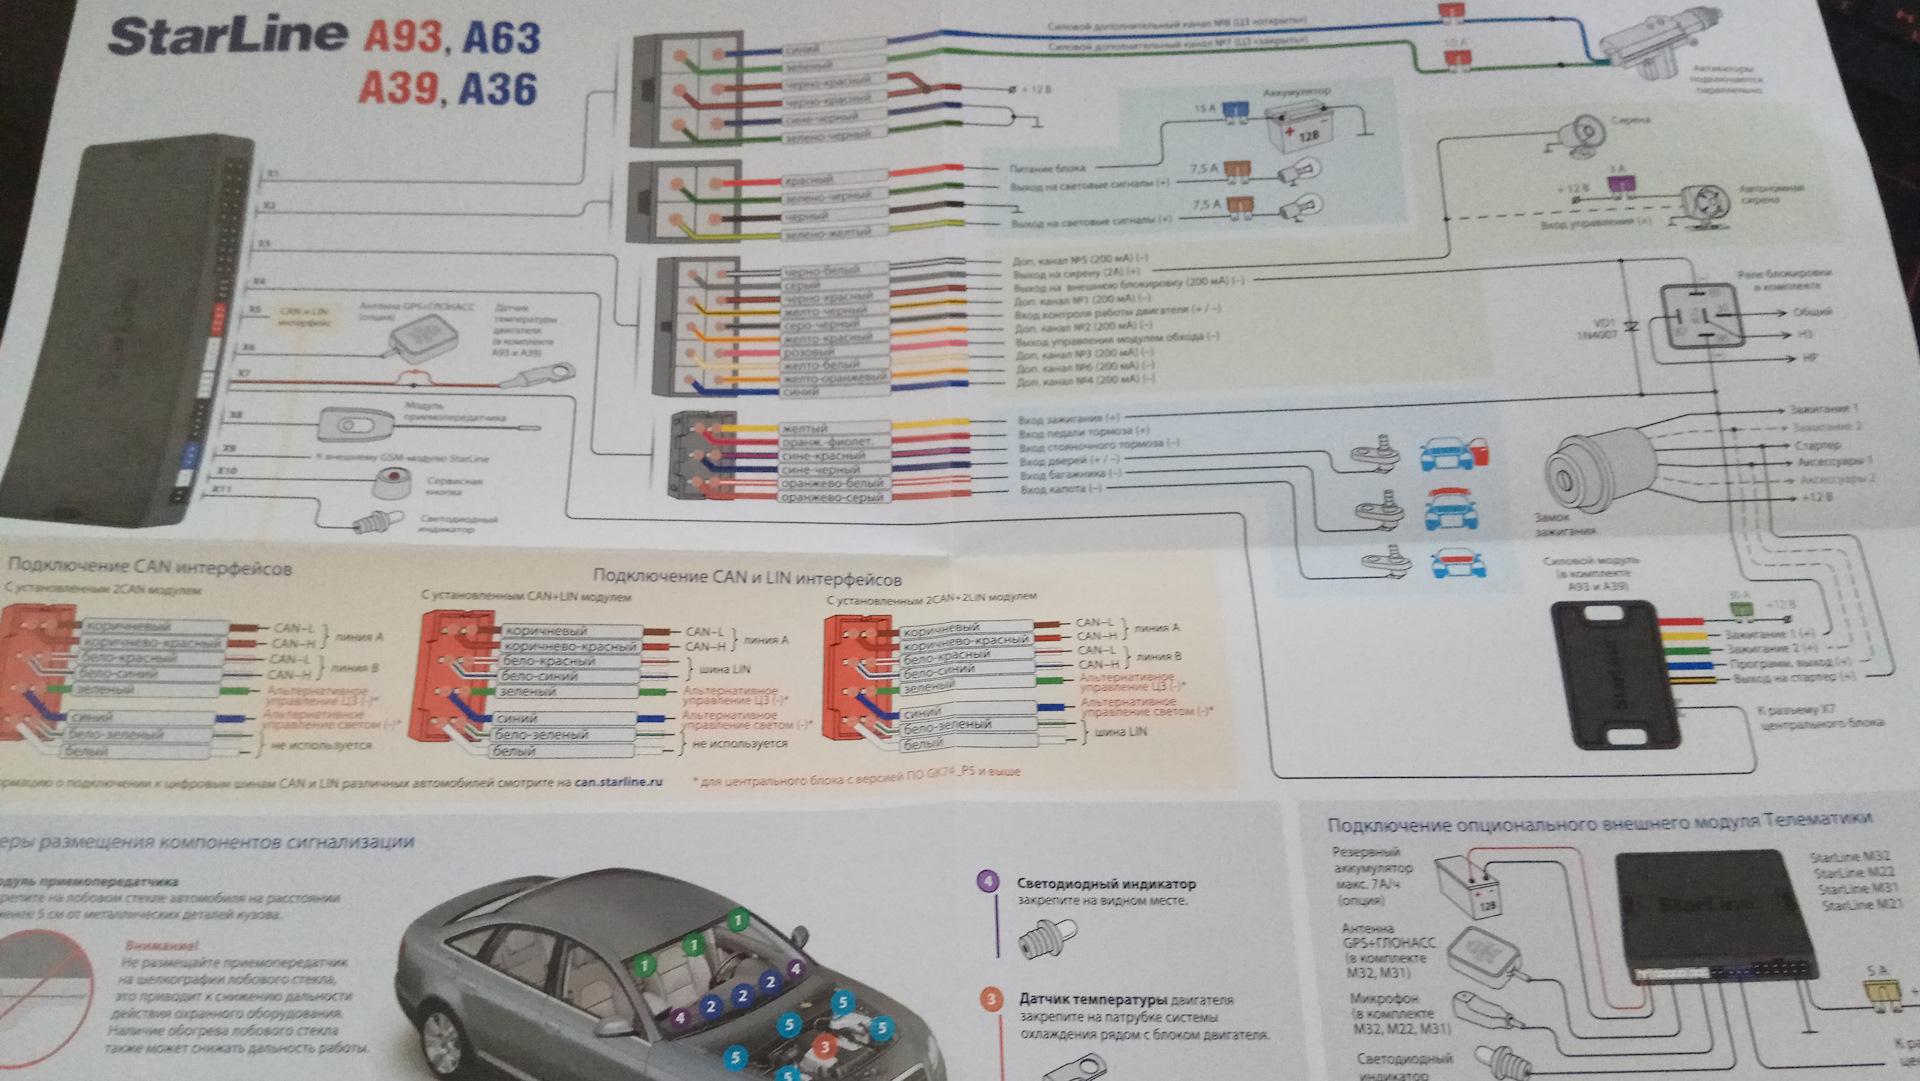 инструкция по эксплуатации starline a93 a63